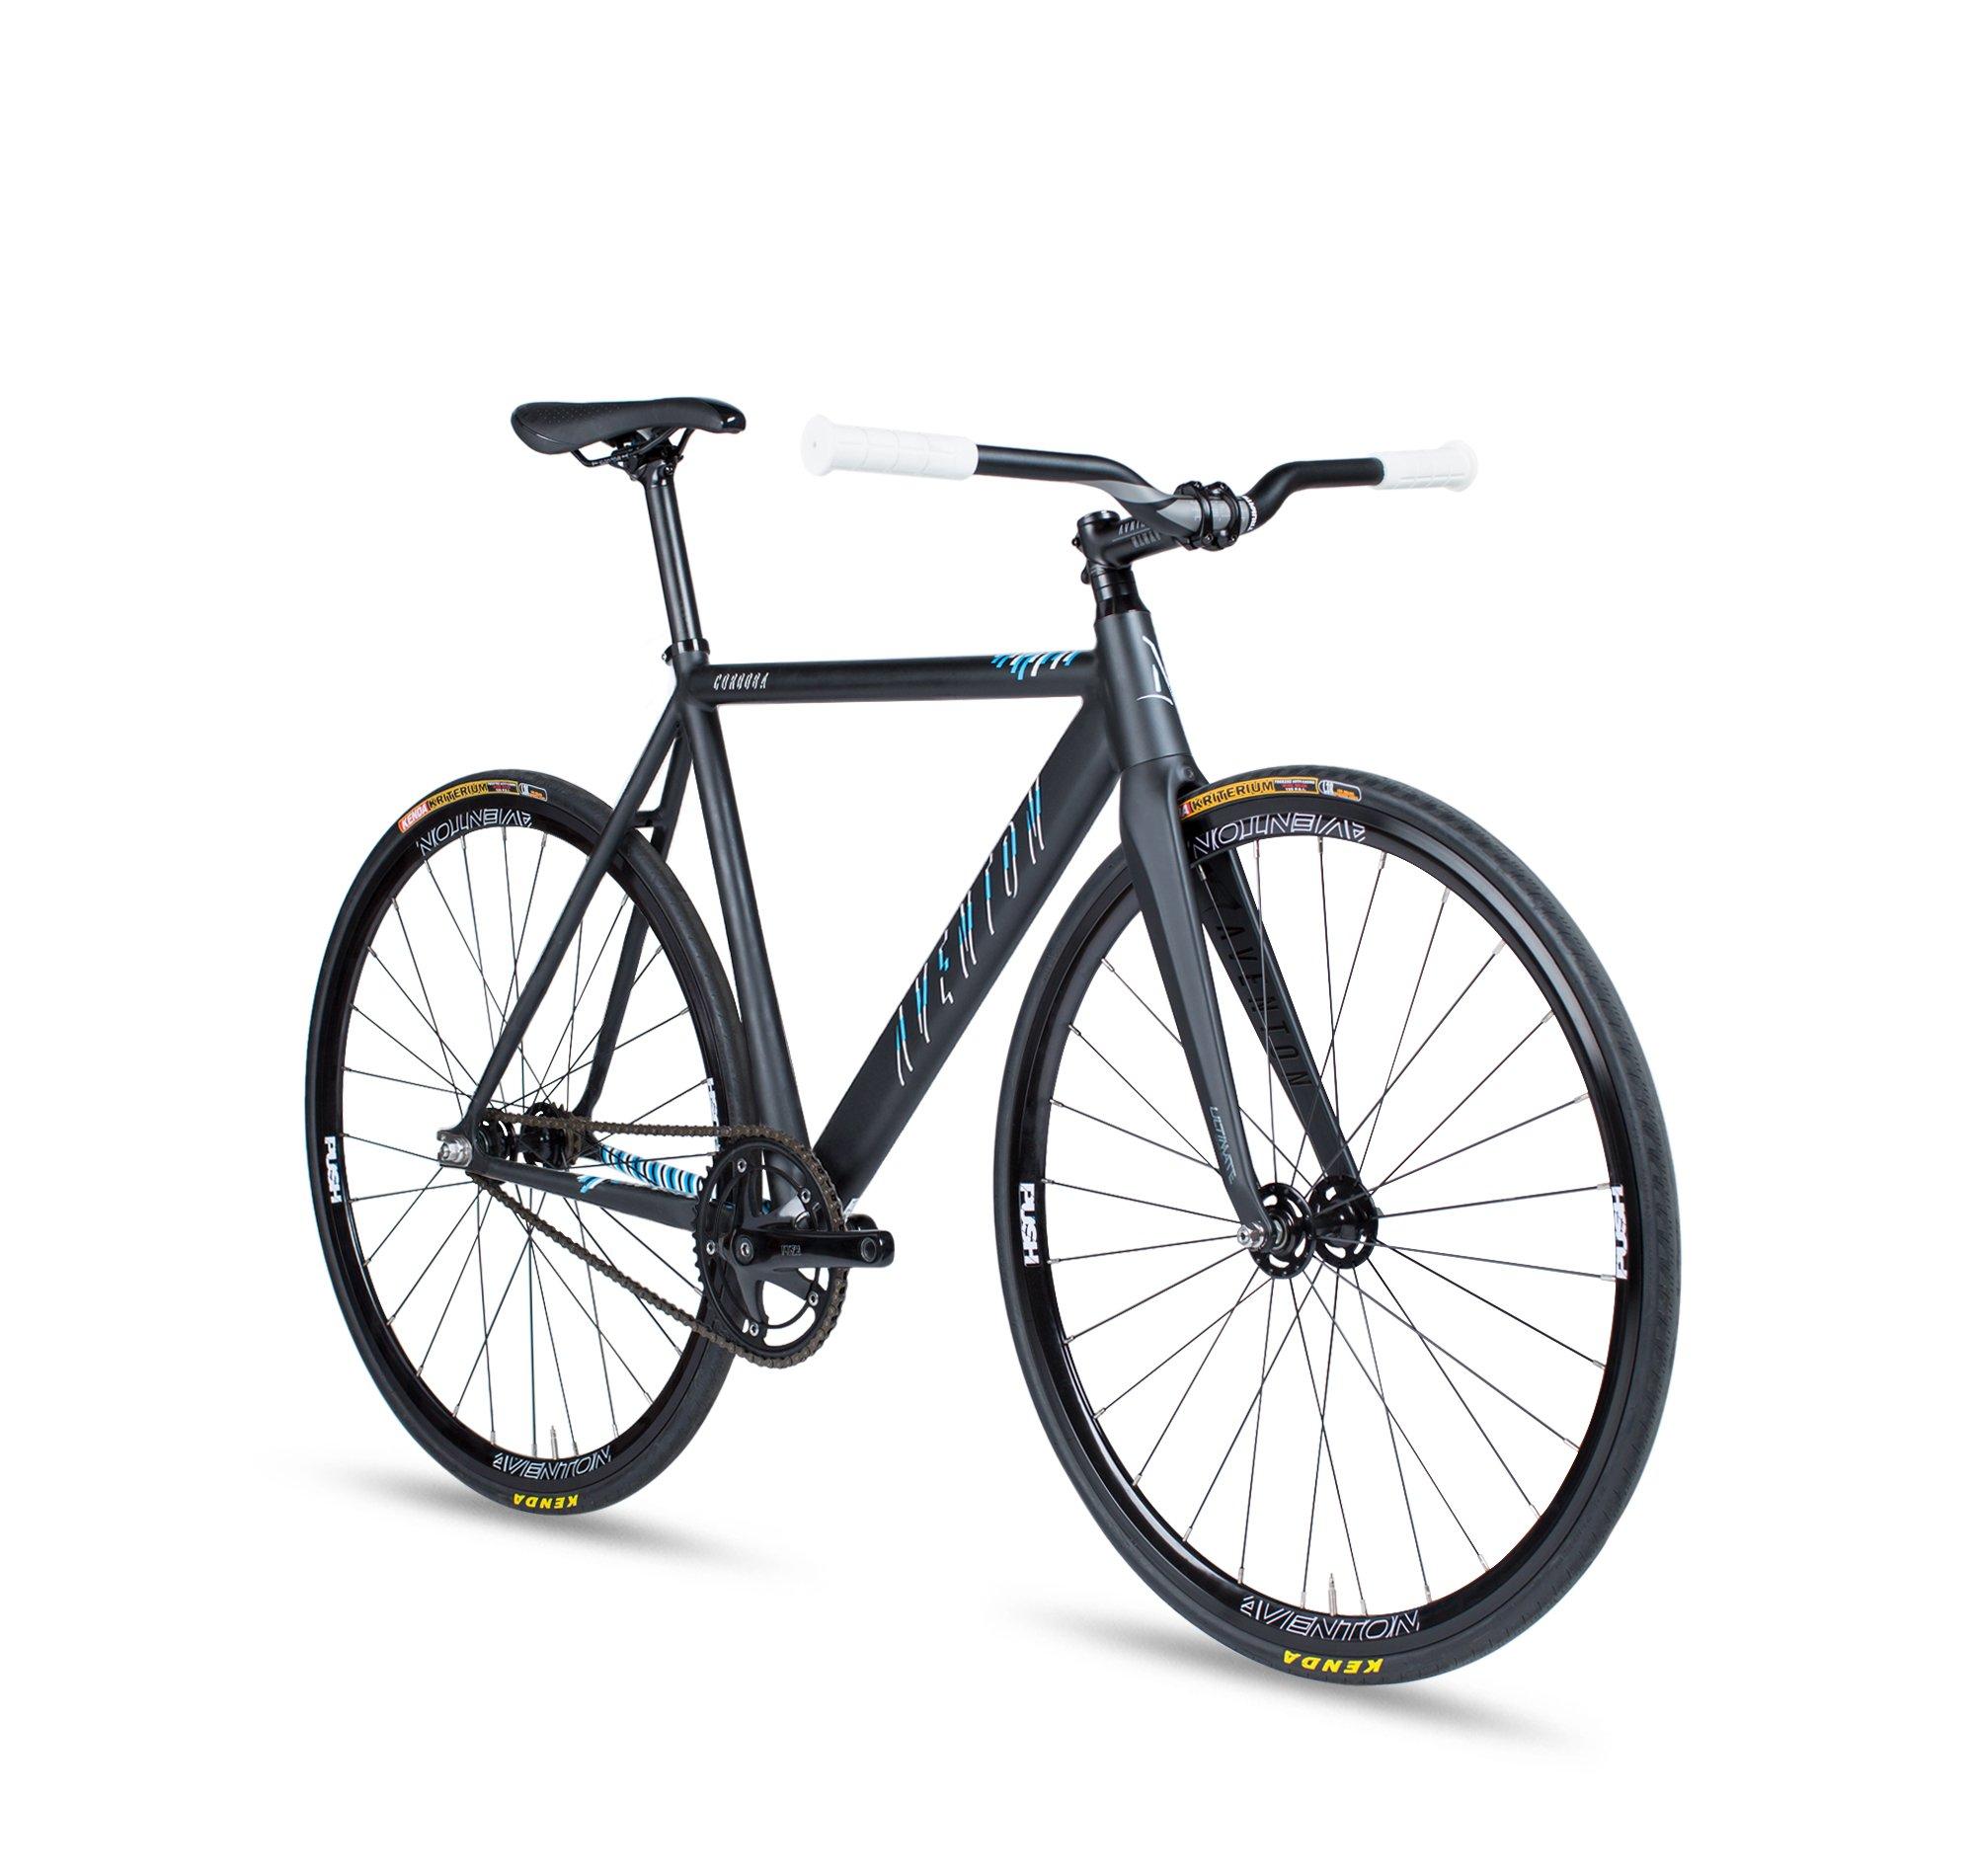 Cordoba Custom Fixed Gear W Riser Bars Bike Bicicletas Vehiculos